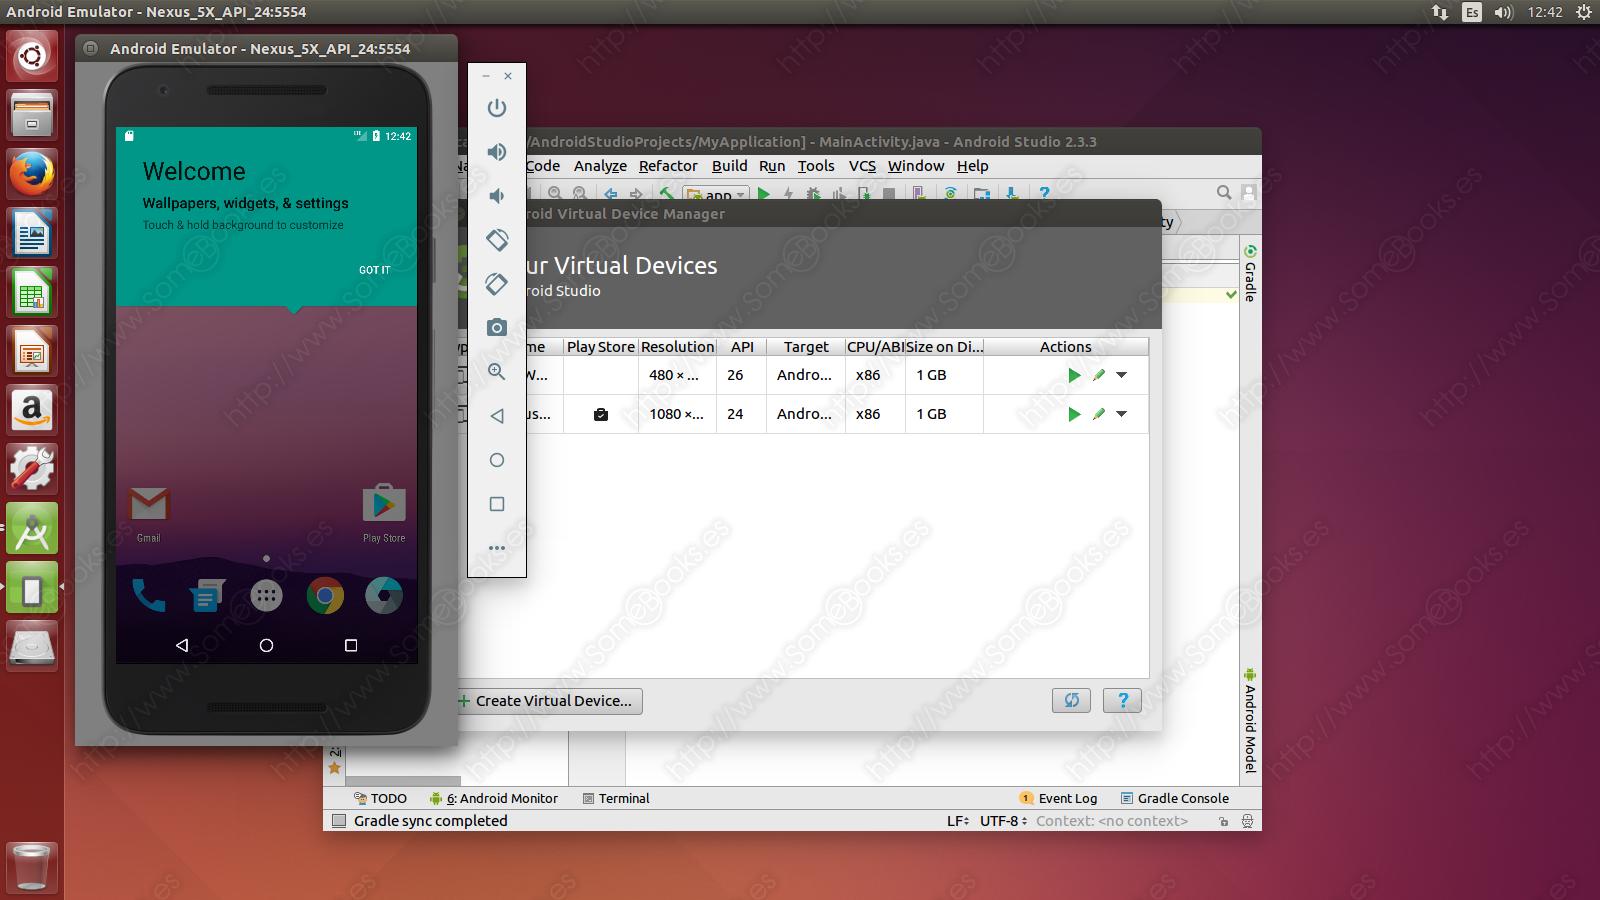 Crear-un-emulador-de-Android-con-Android-Studio-015